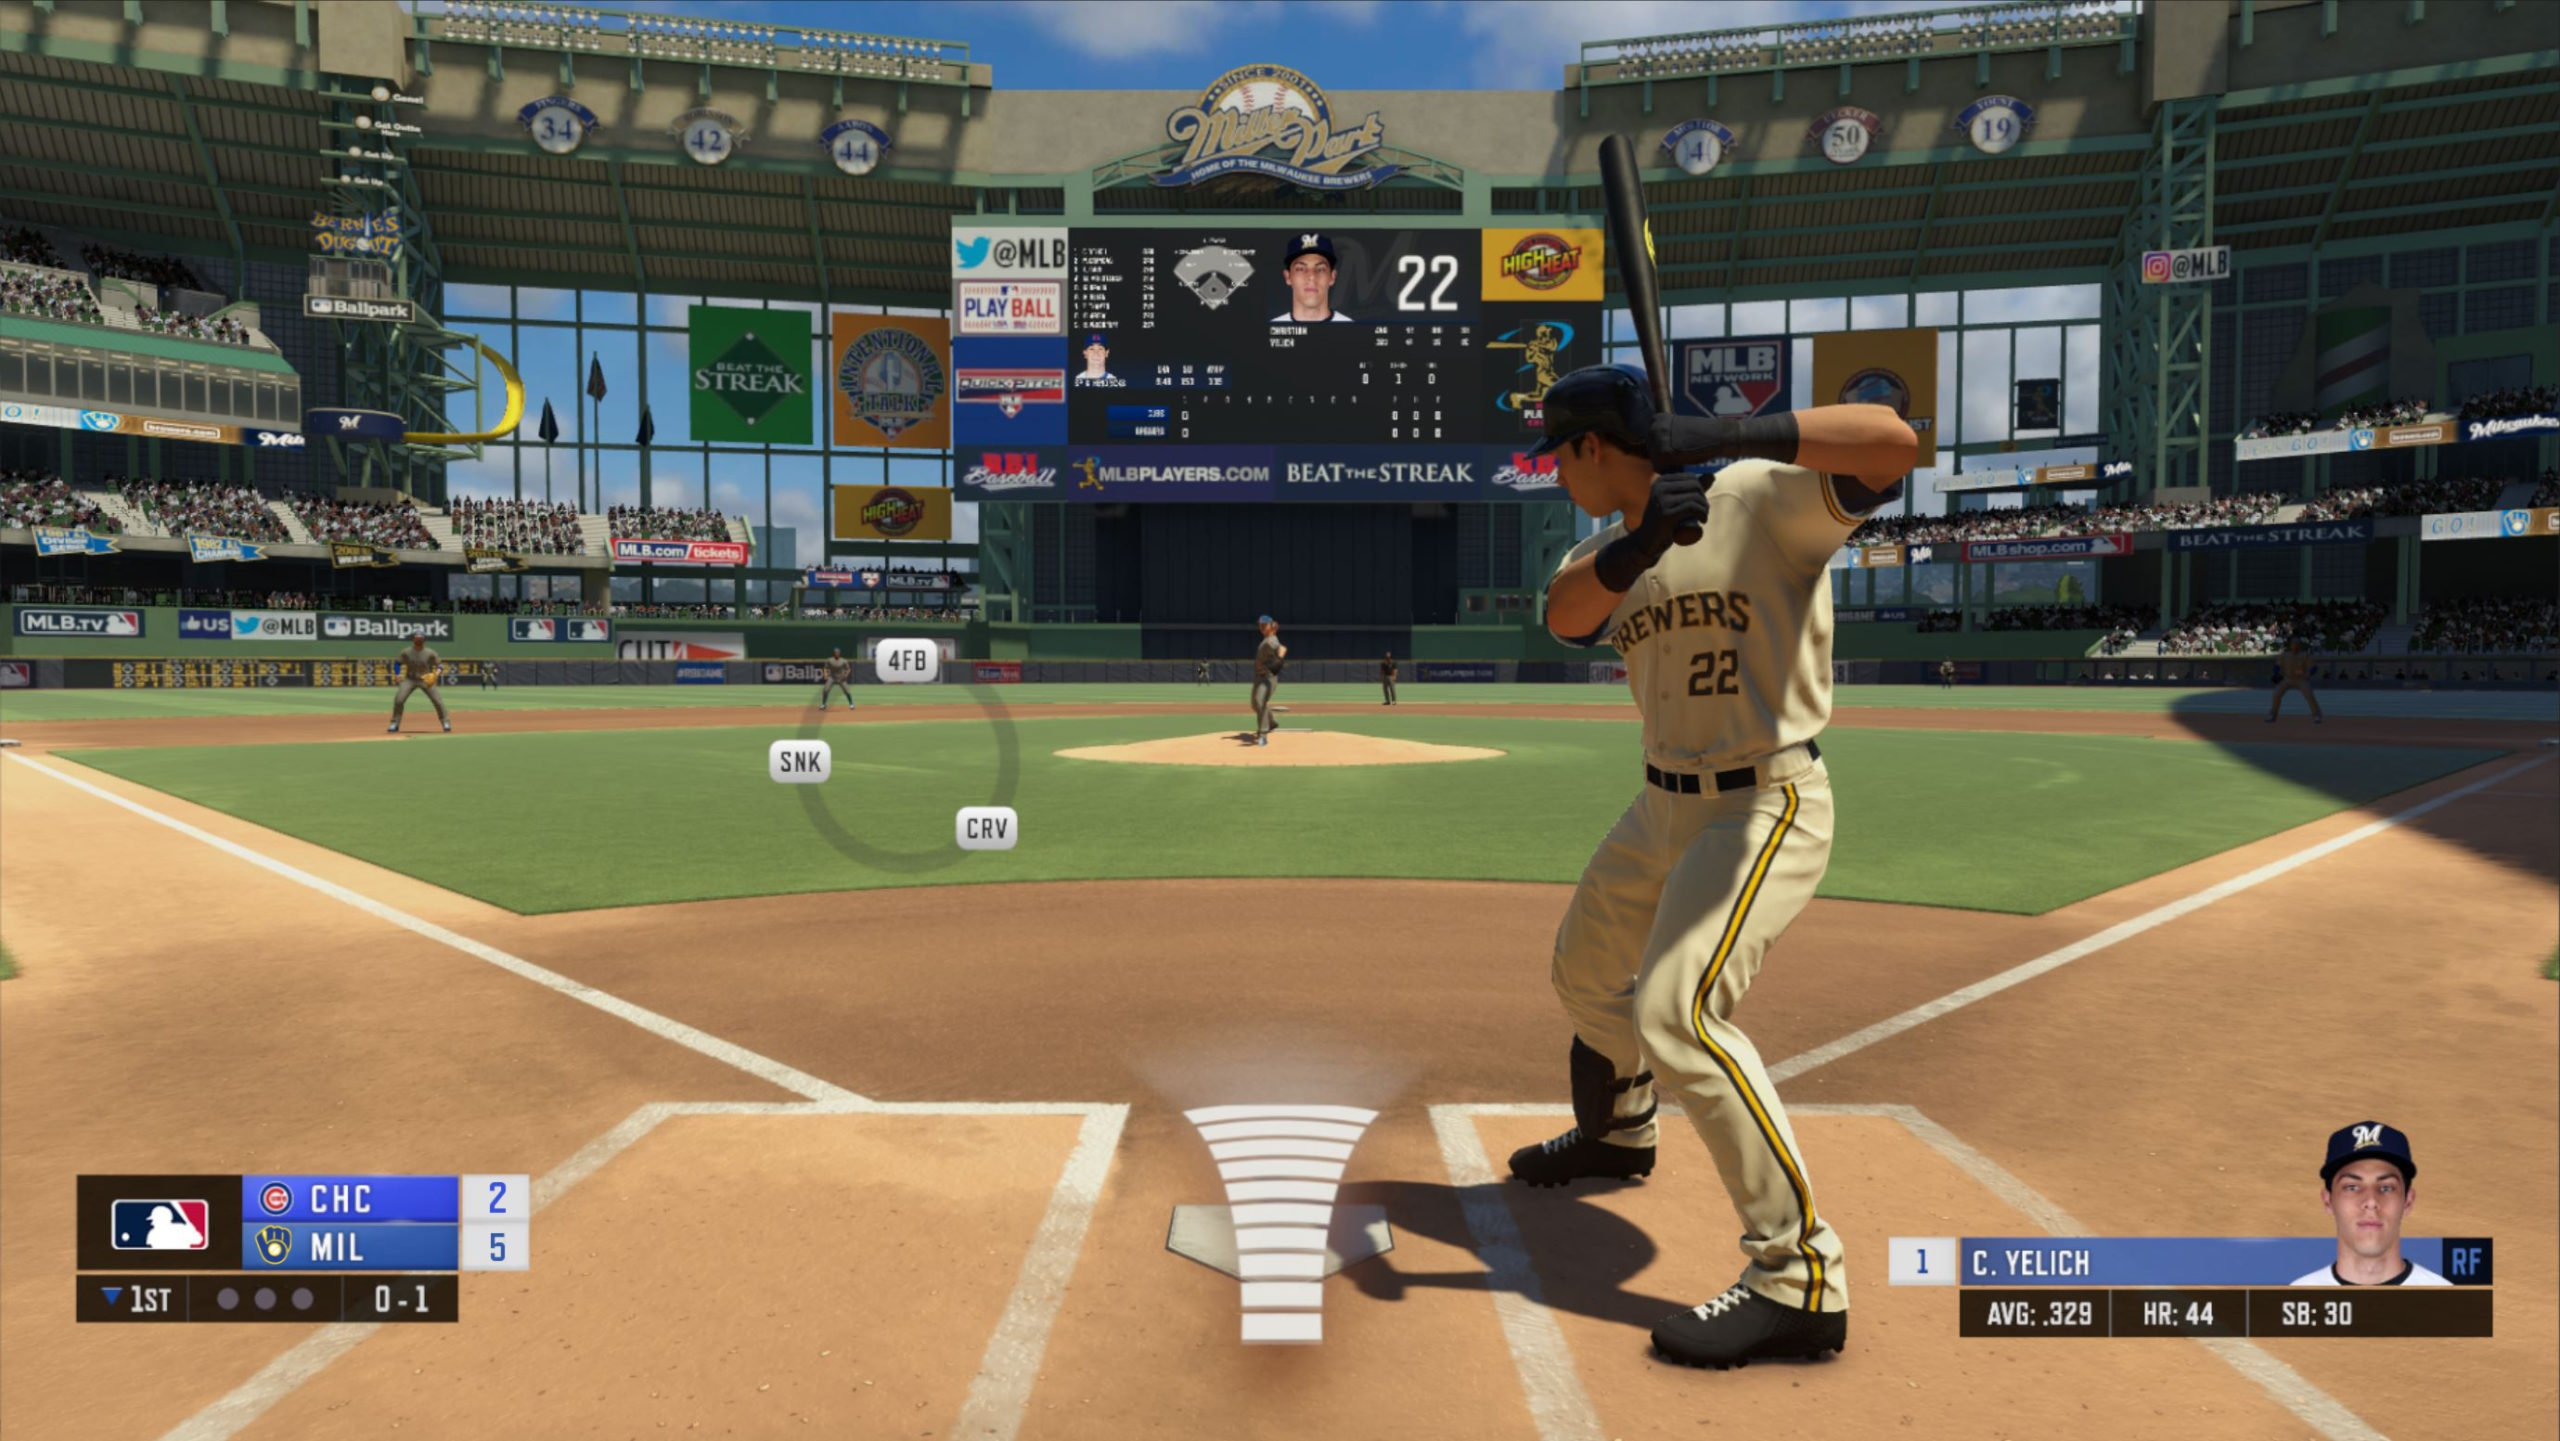 Christian Yelich cover star R.B.I. Baseball 20